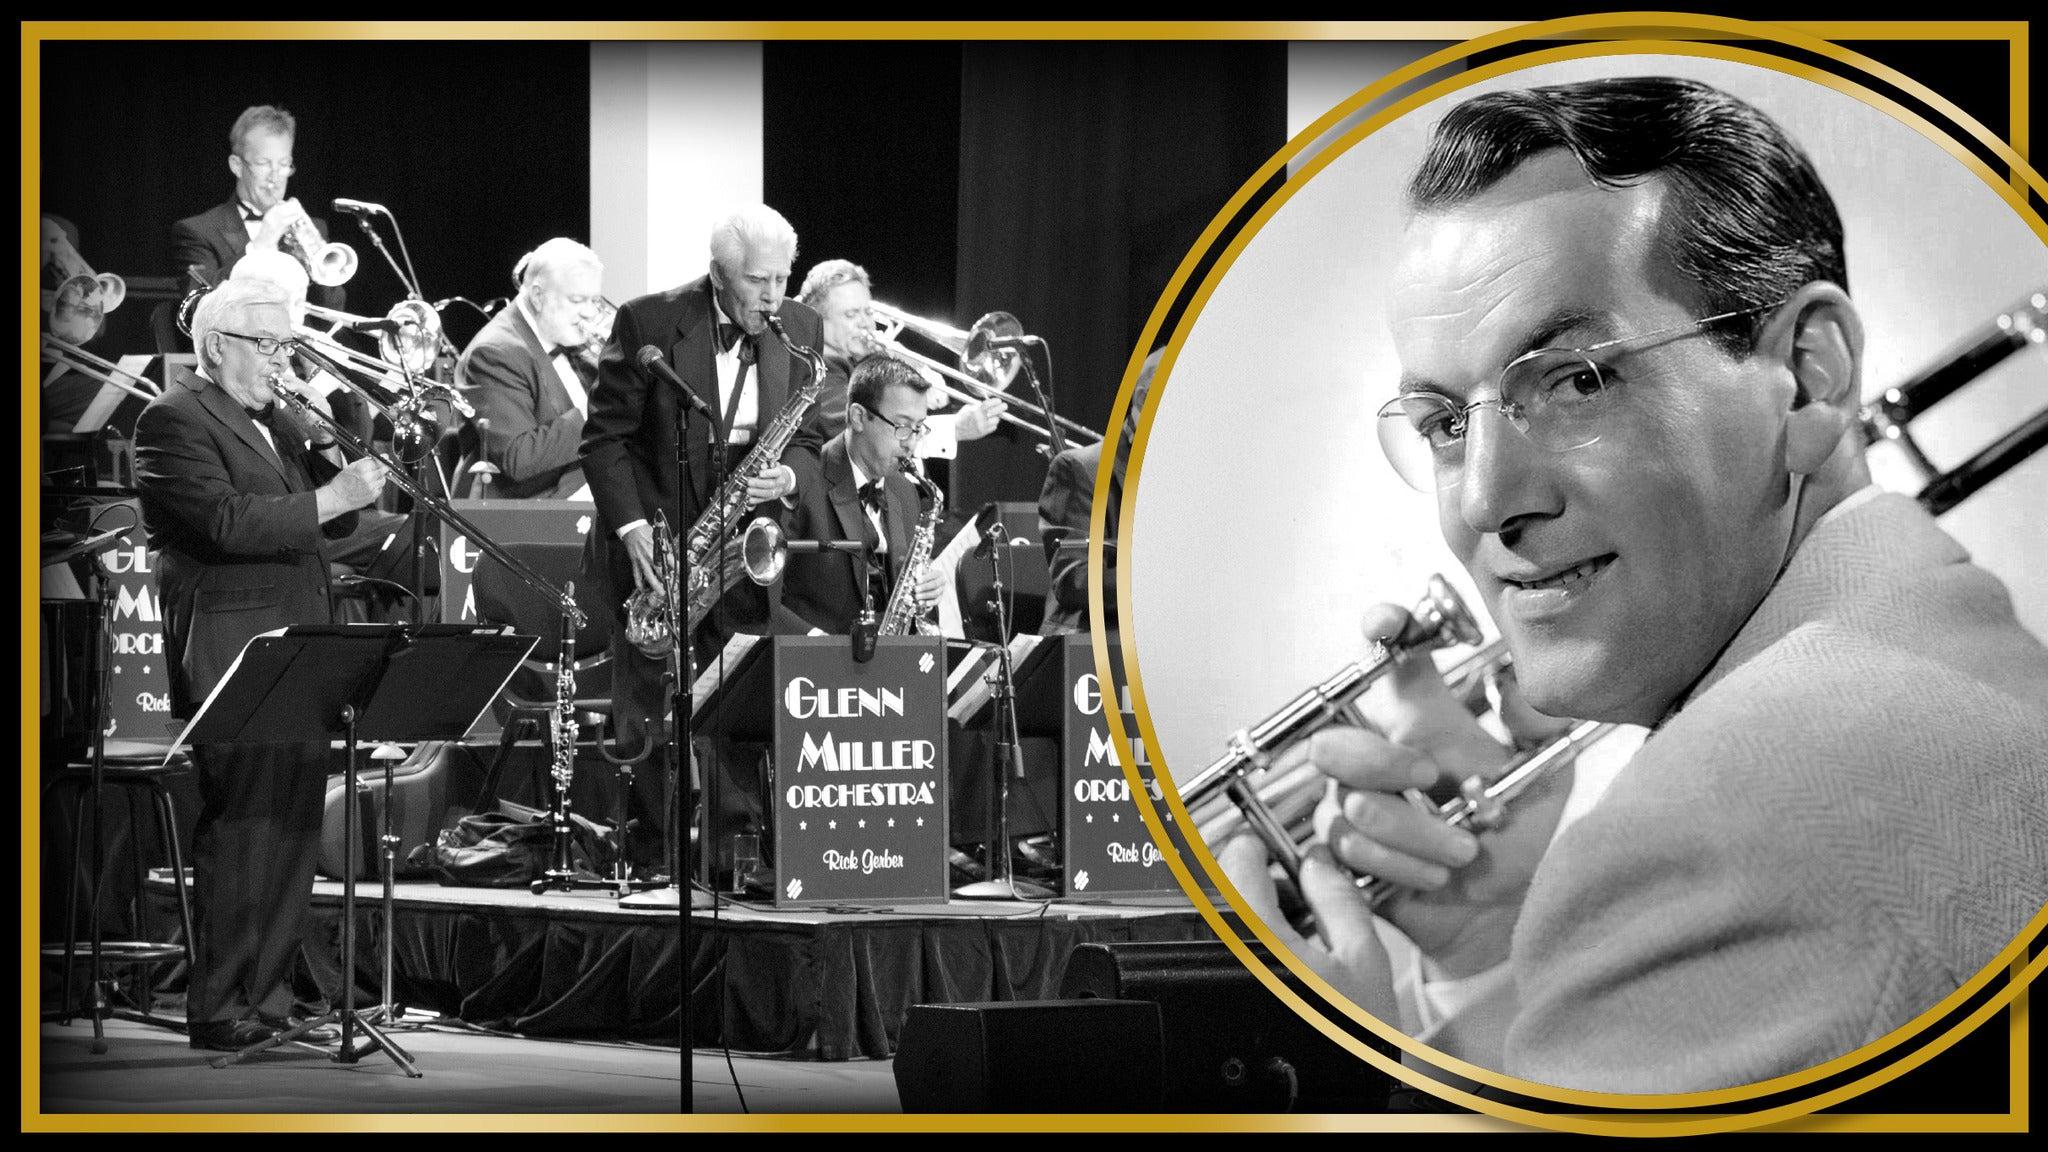 Glenn Miller Orchestra at Ridgefield Playhouse